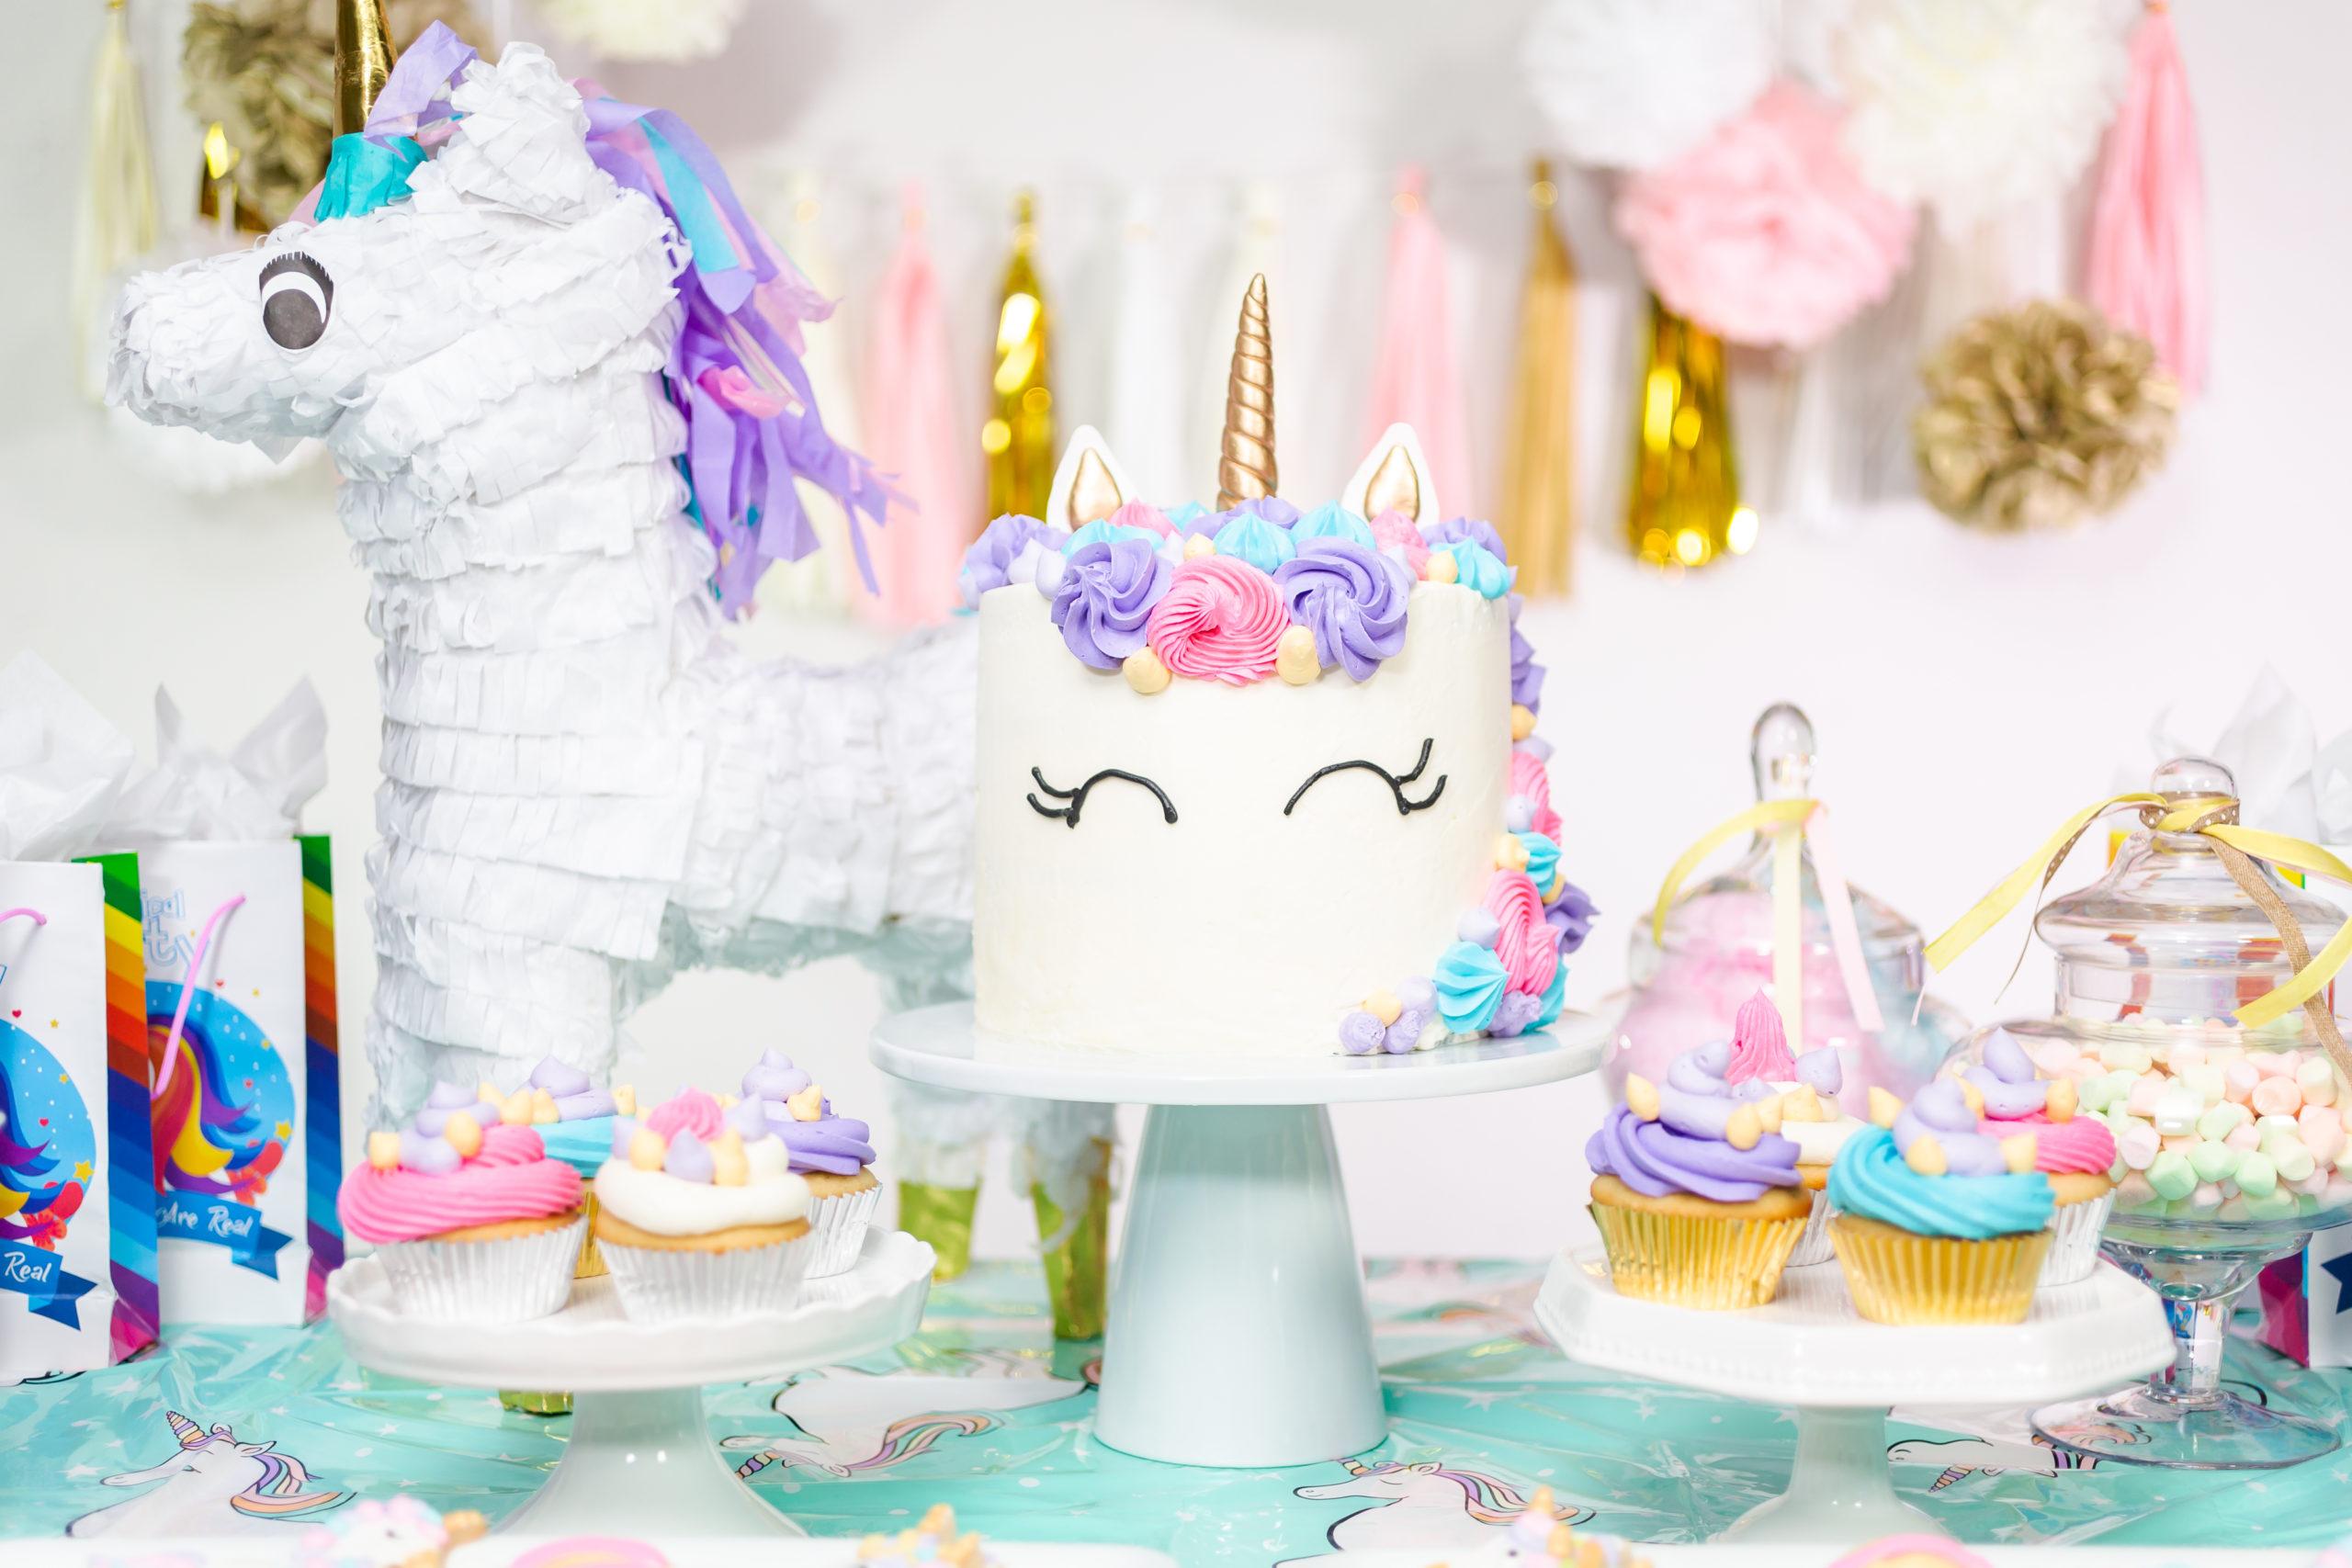 The Unicorn Birthday Party